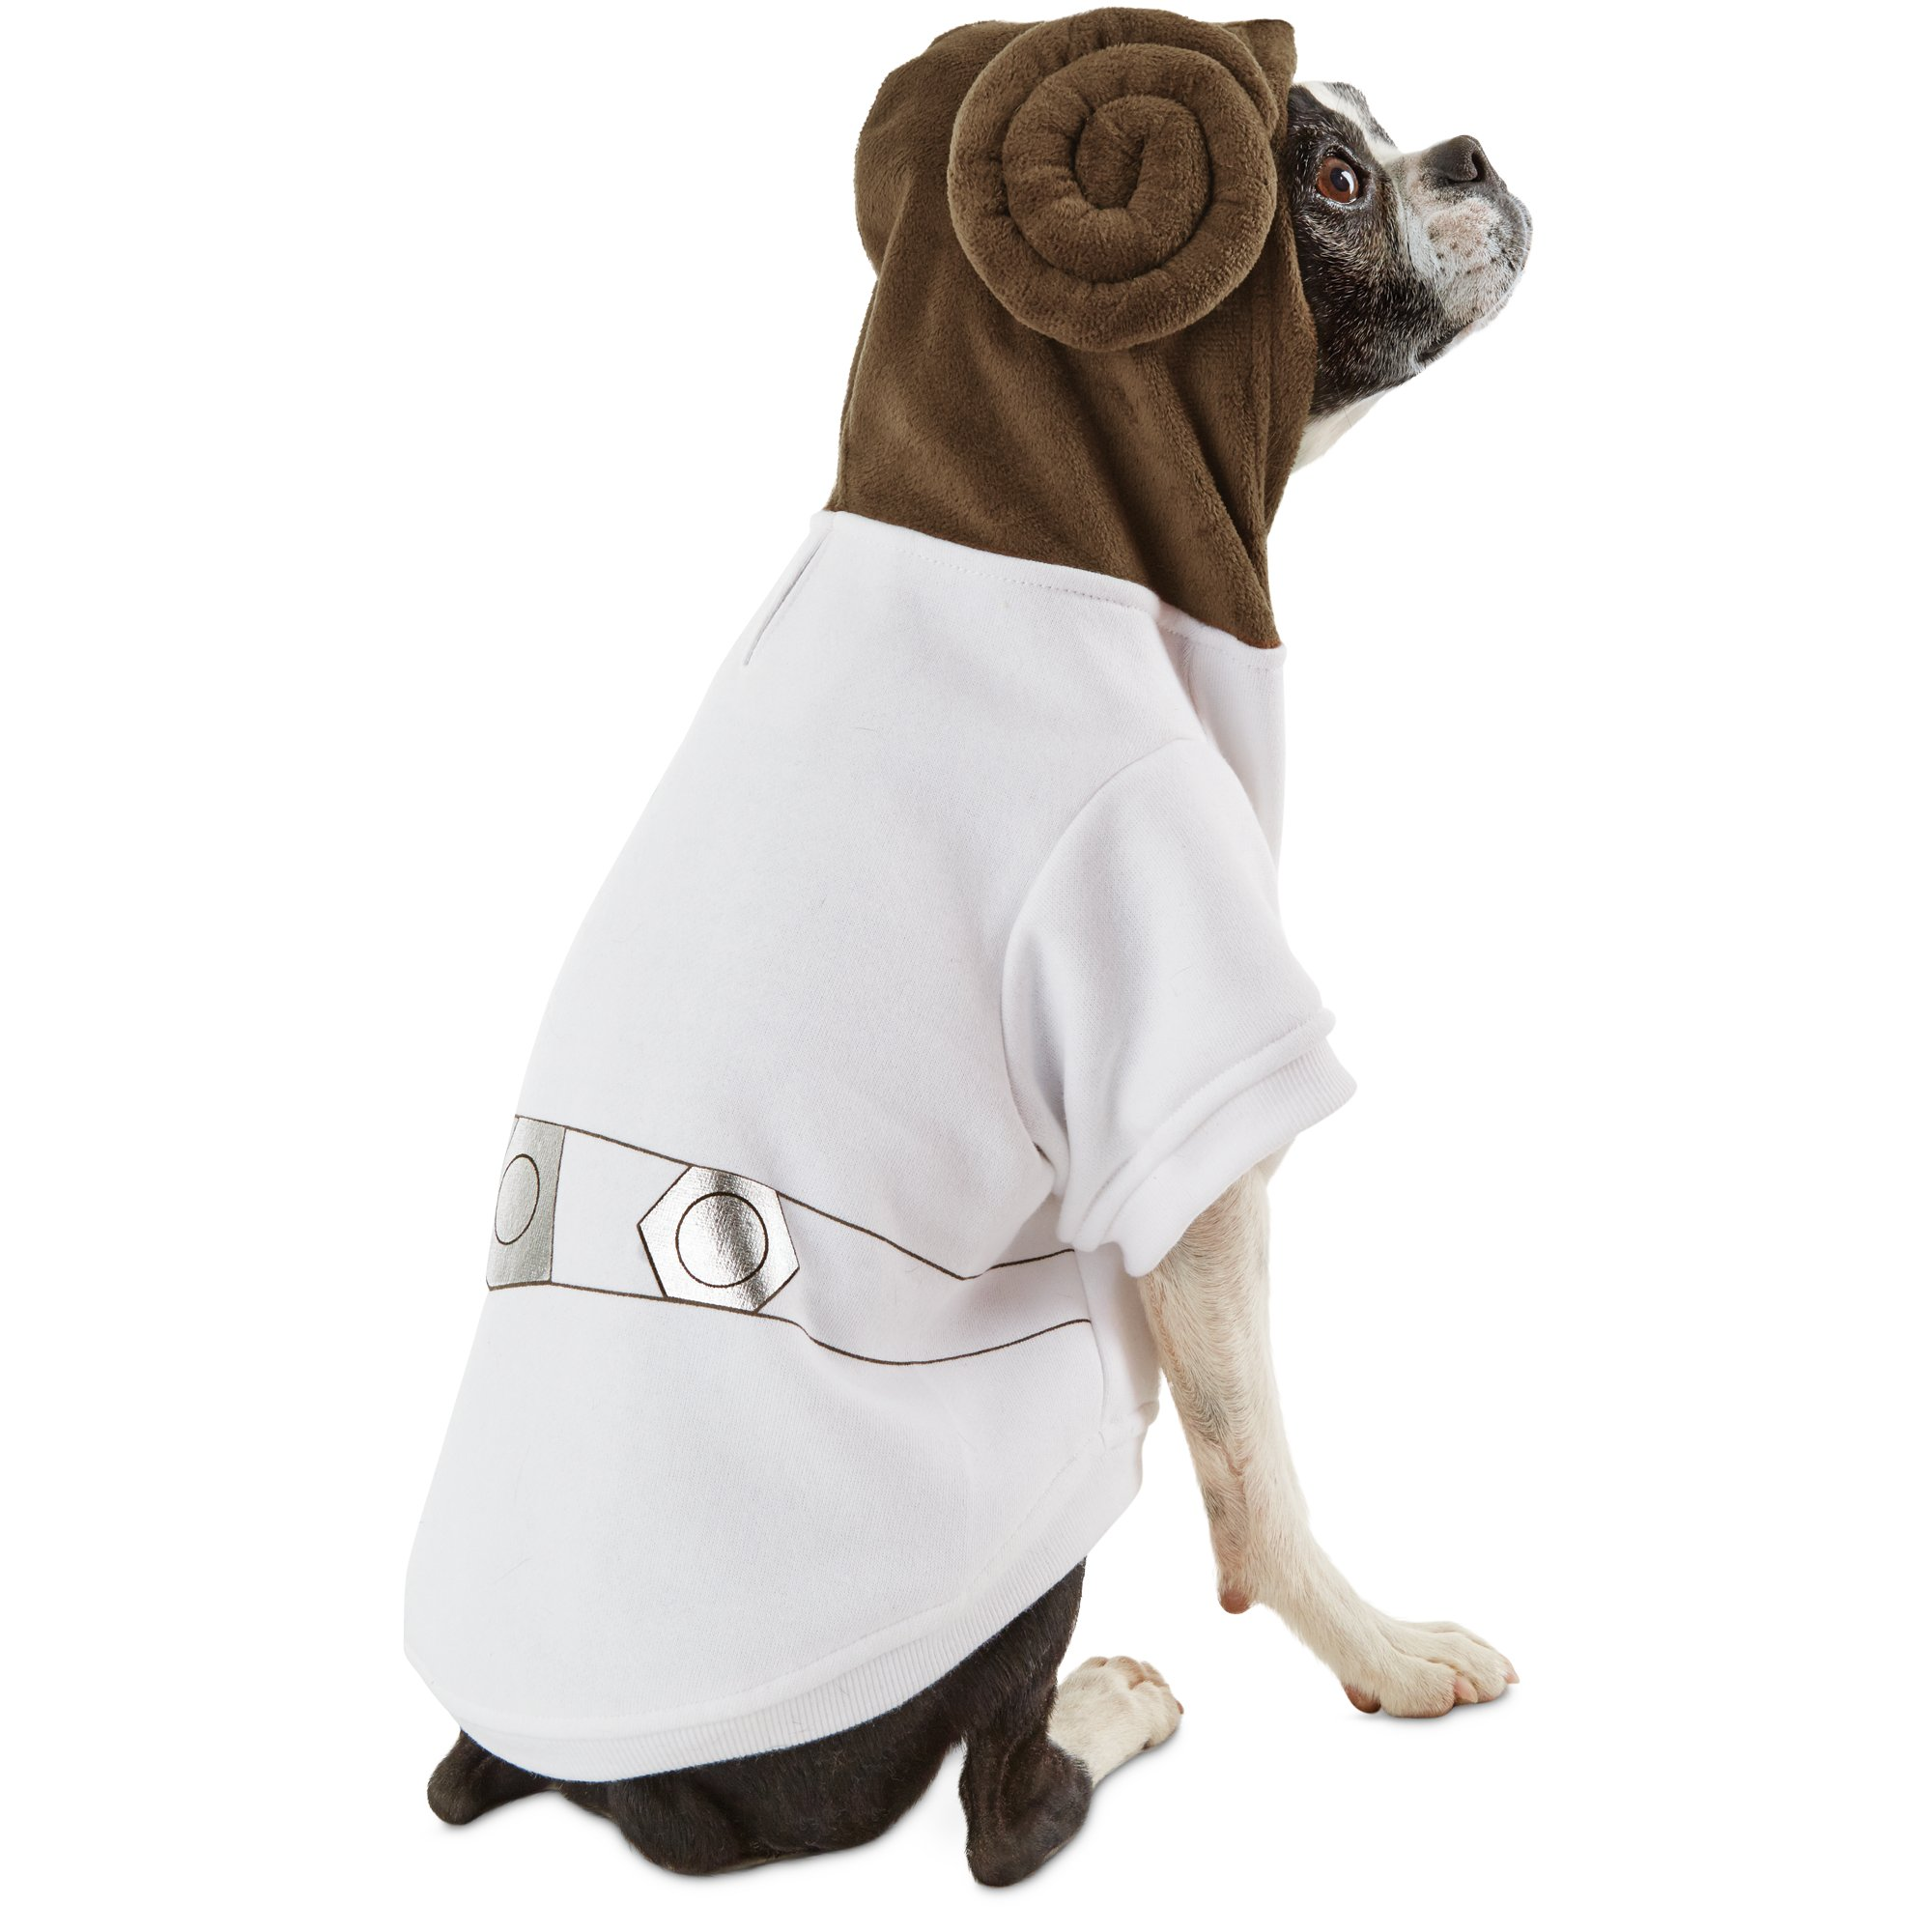 STAR WARS Princess Leia Dog Hoodie